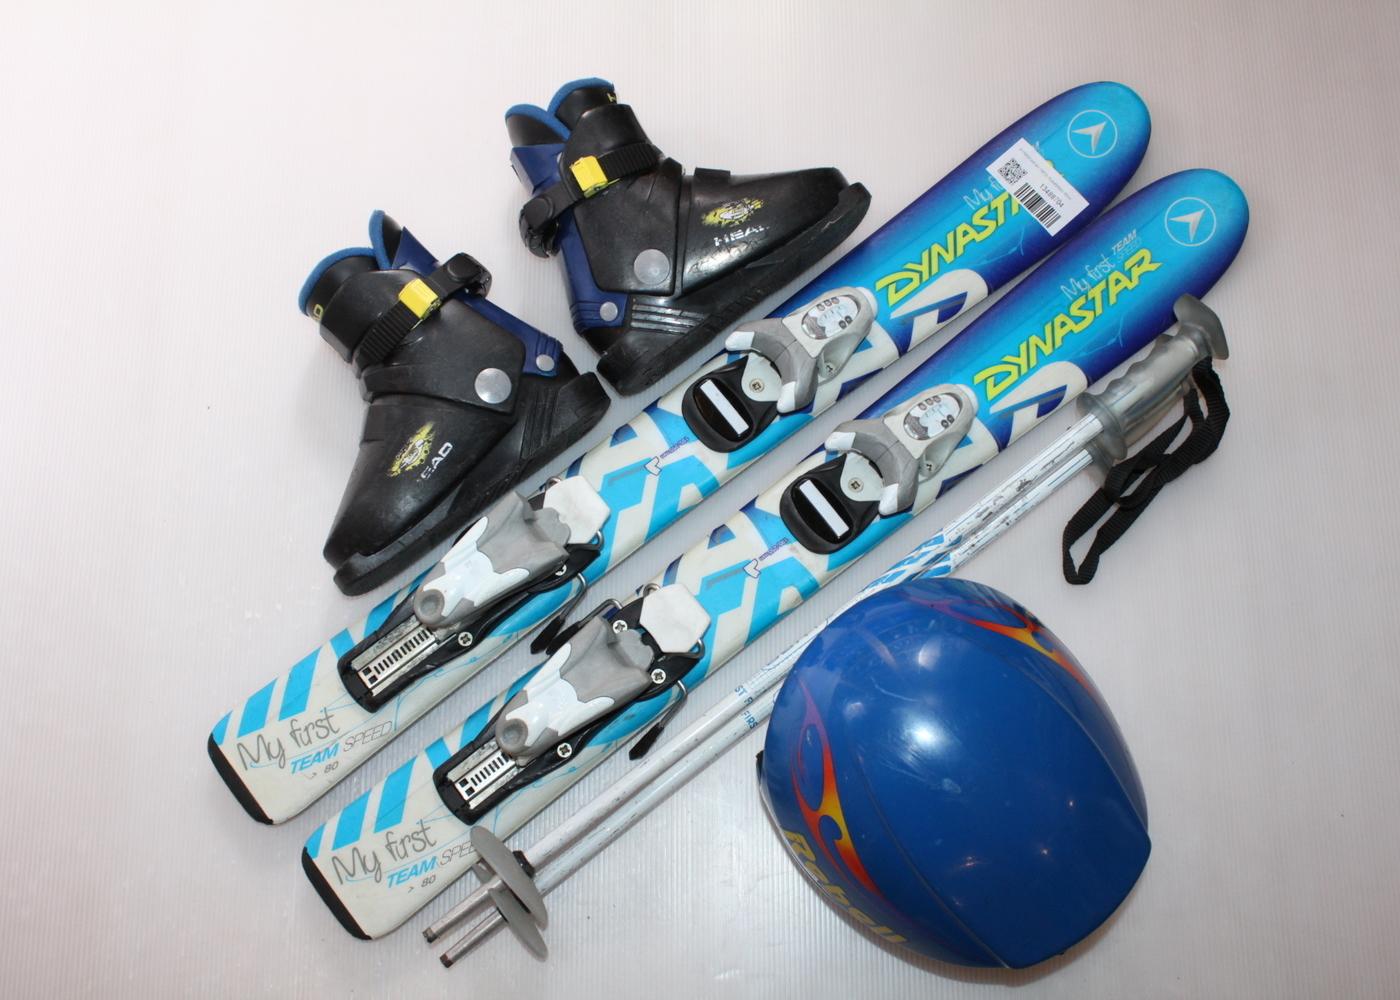 Dětské lyže DYNASTAR MY FIRTS TEAMSPEED 80 cm + lyžáky  28EU + helma